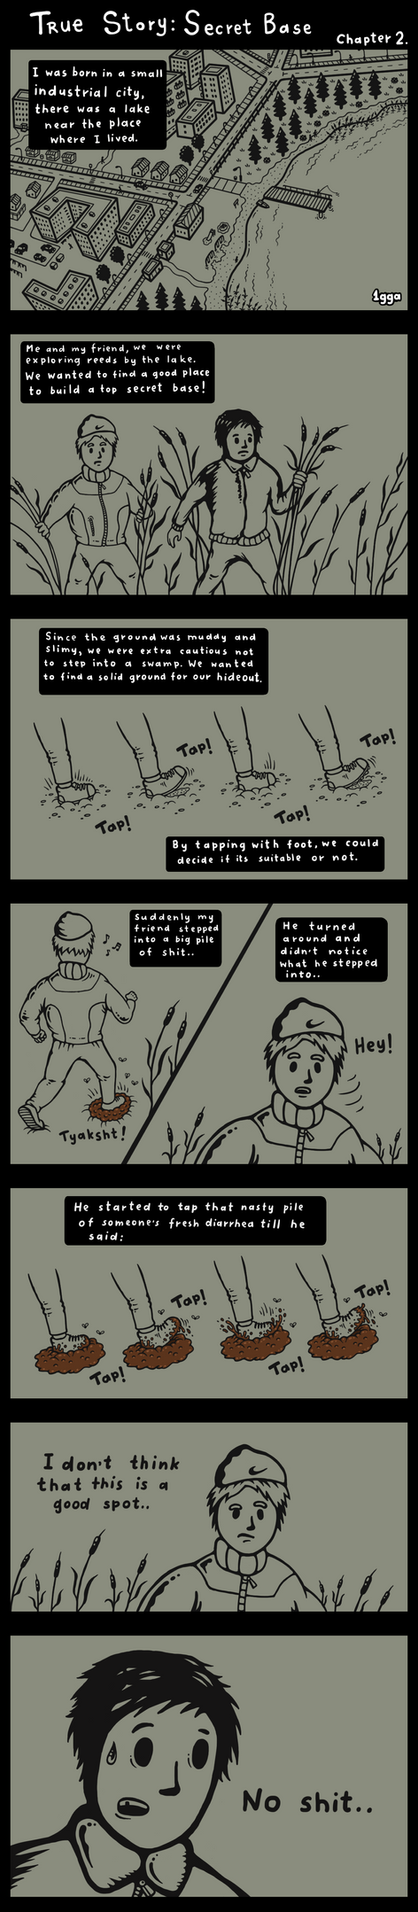 True Story: Secret Base Chapter 2 by 1gga